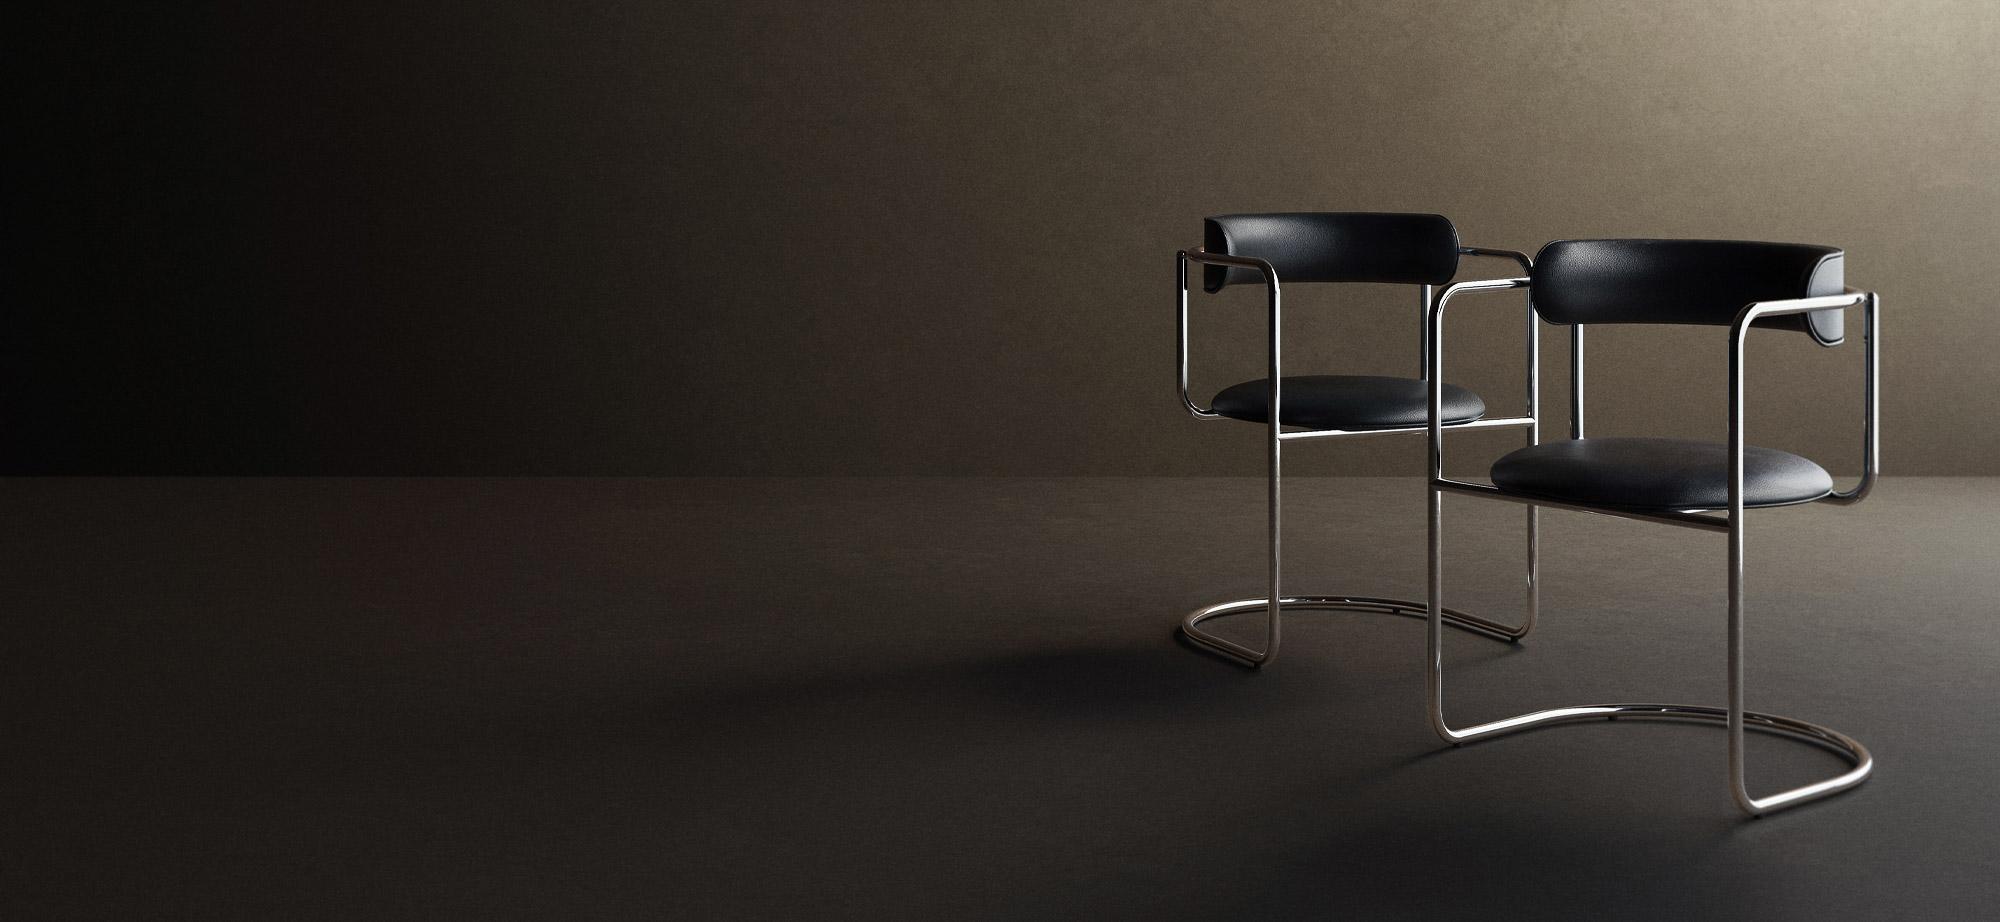 Savannah_Bay_Gallery_Design_Contemporary_Furniture_Home